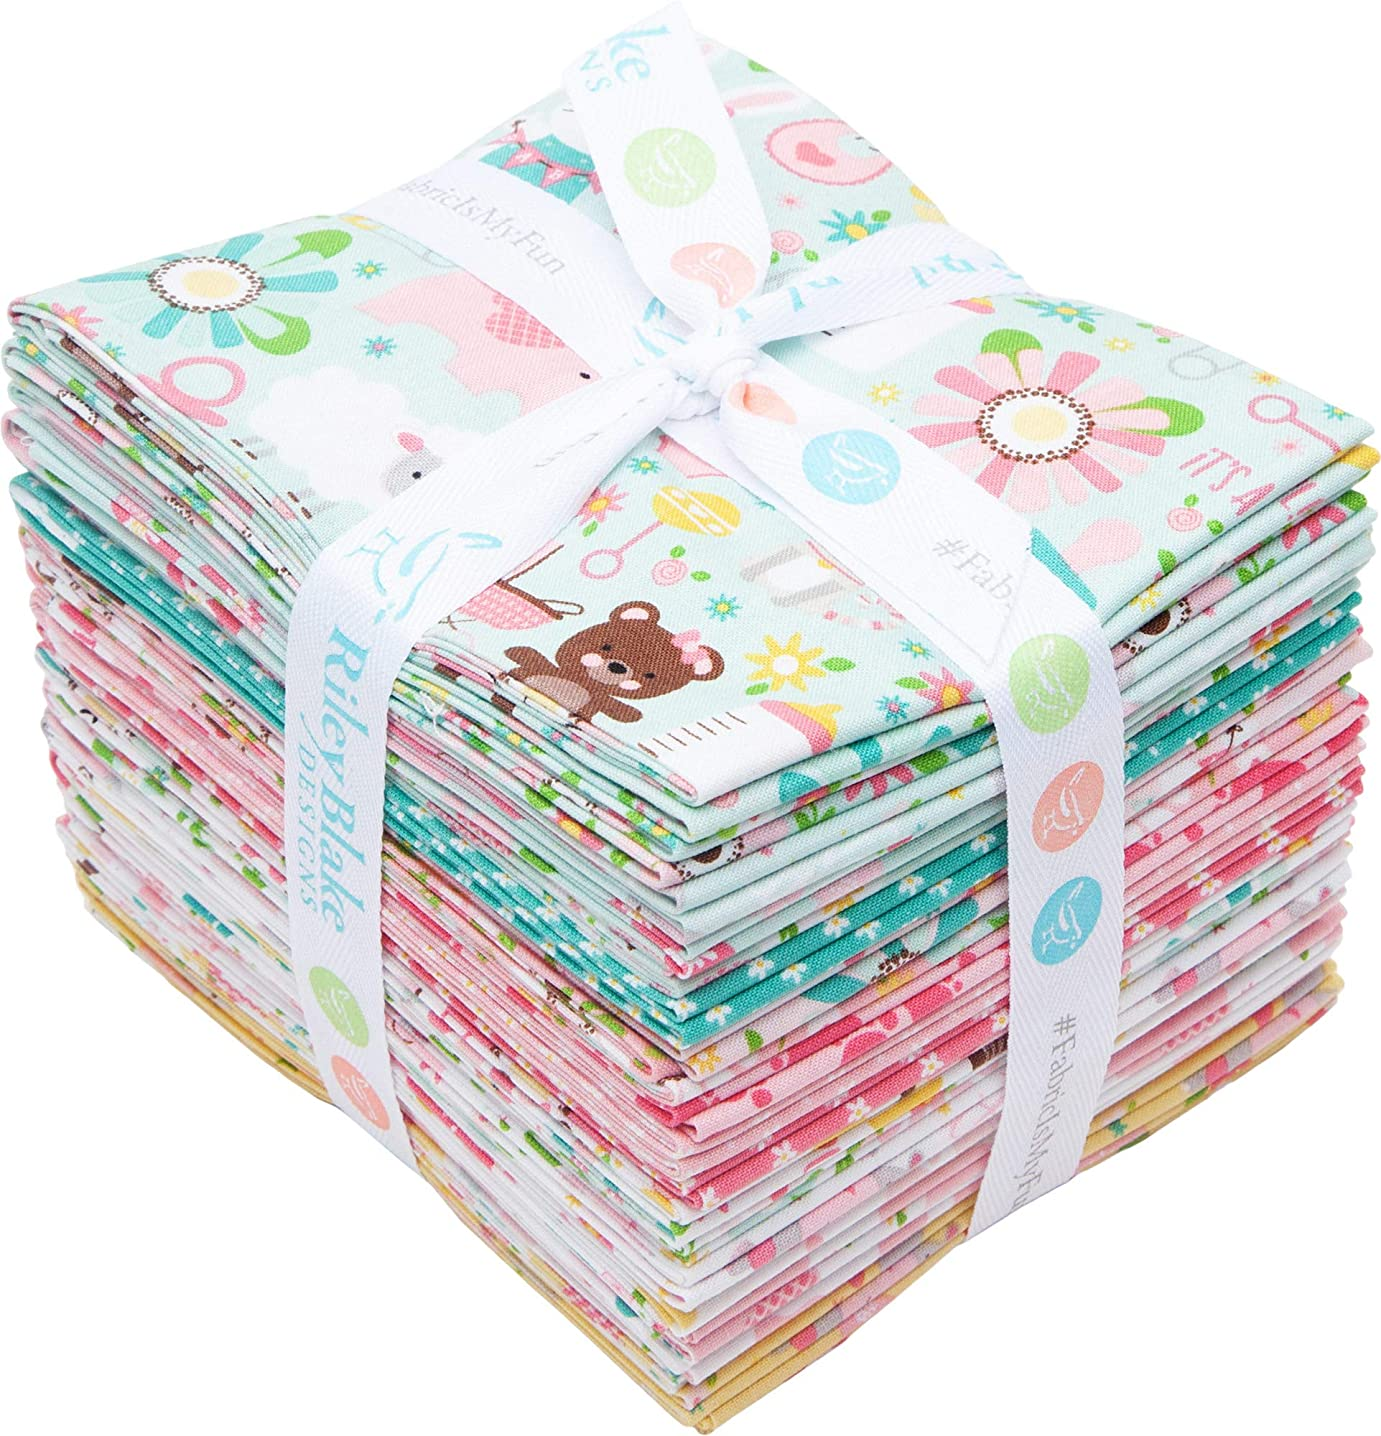 Lori Whitlock Sweet Baby Girl 21 Fat Quarters Riley Blake Designs FQ-8190-21